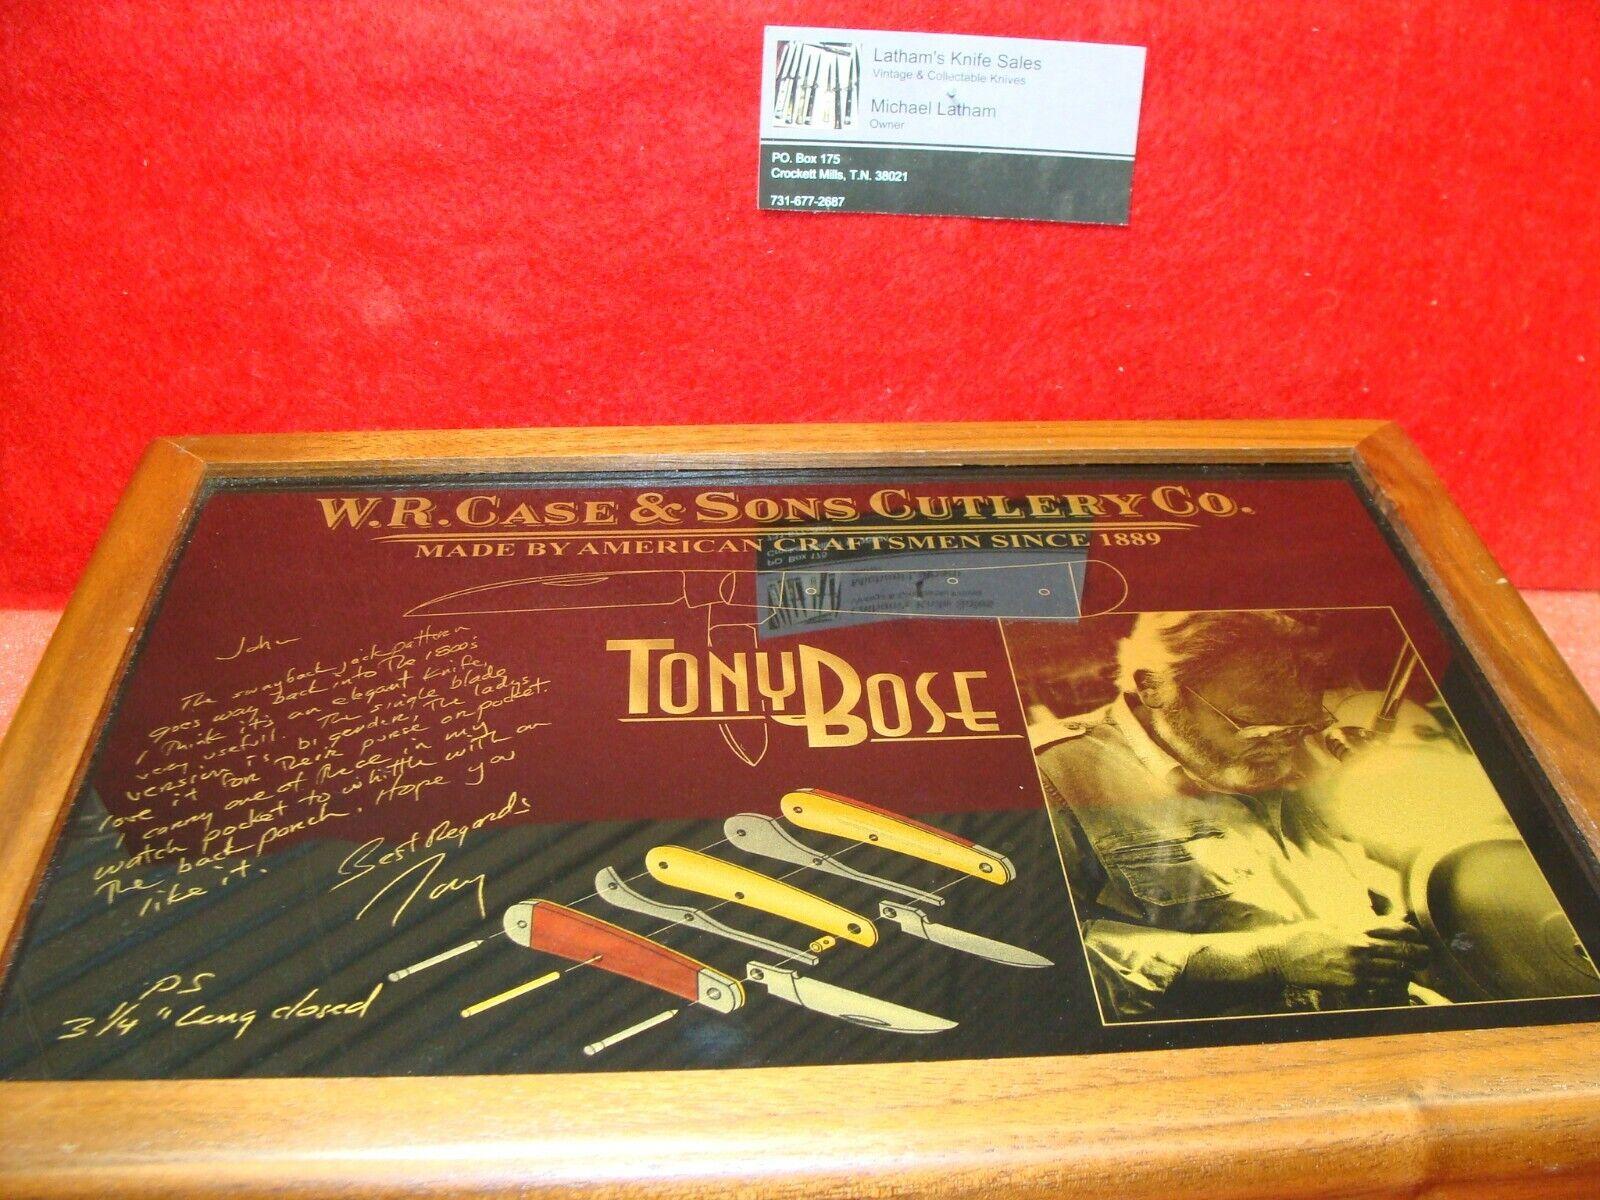 CASE XX USA 2008 TONY BOSE COMMEMORATIVE 3 KNIFE SET TB62117,TB6339,TB62110